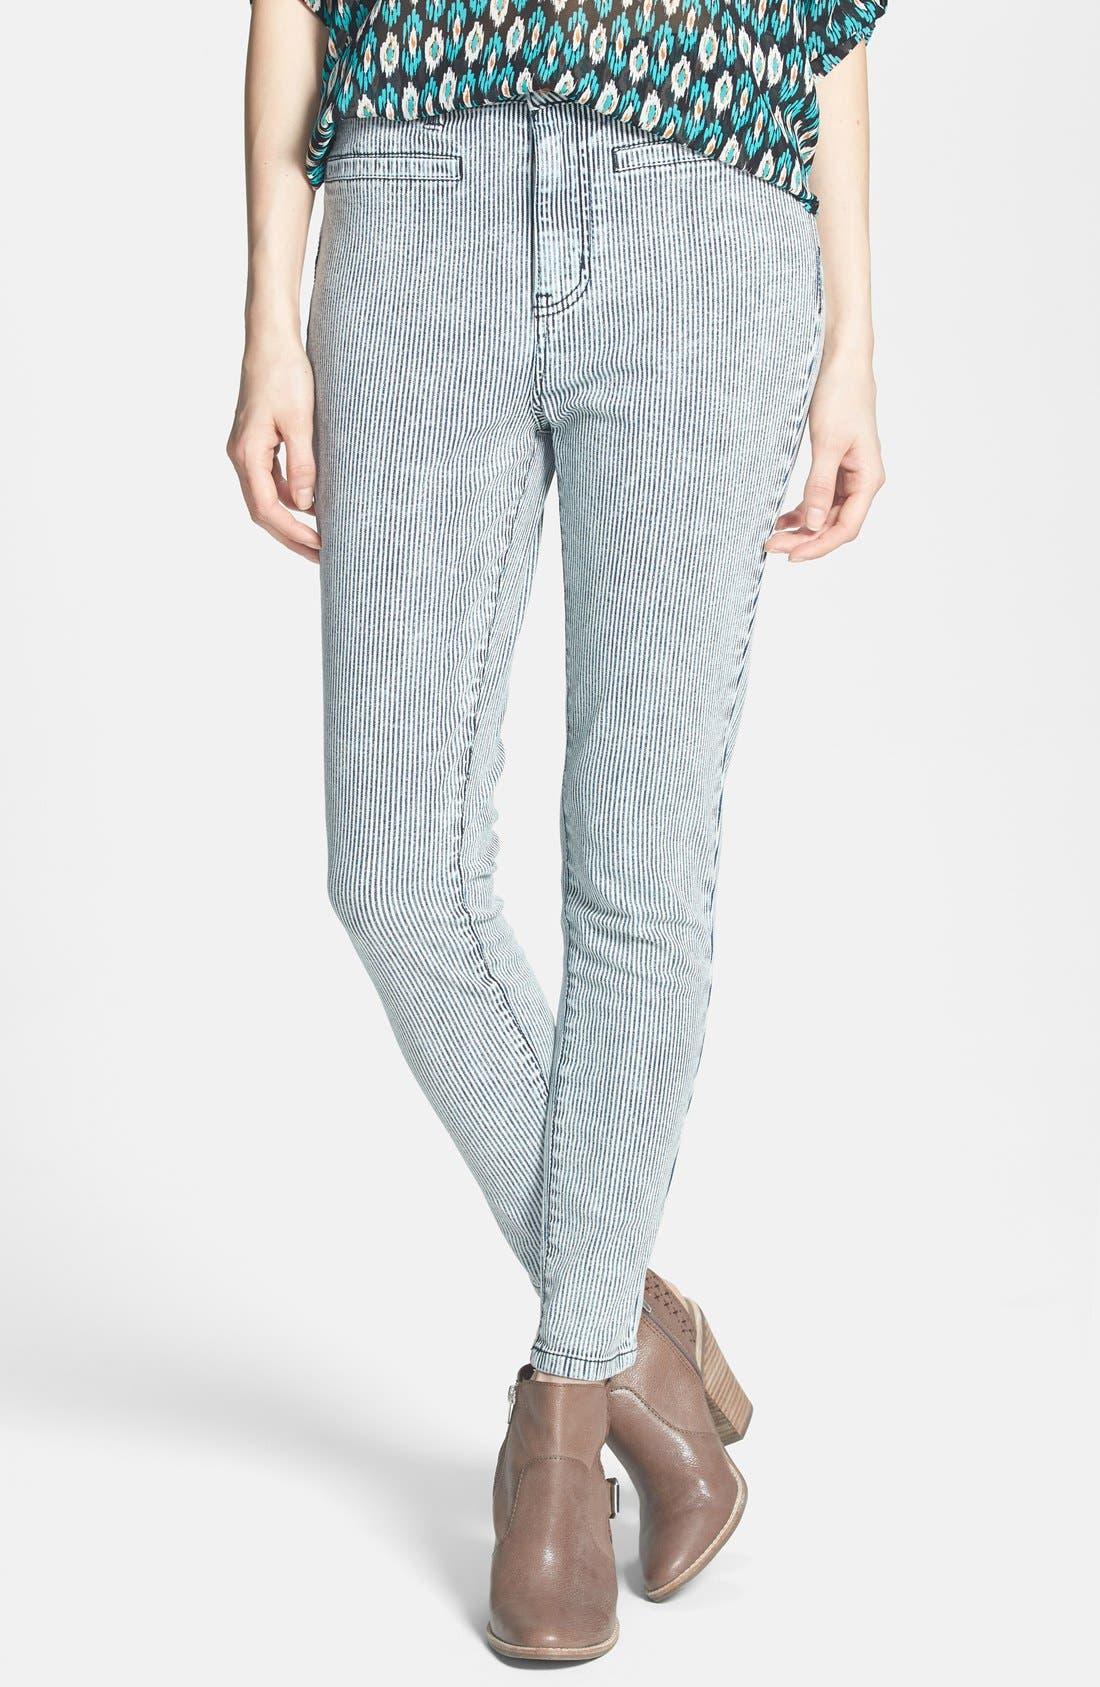 Alternate Image 1 Selected - Fire High Waist Skinny Jeans (Railroad Stripe) (Juniors)